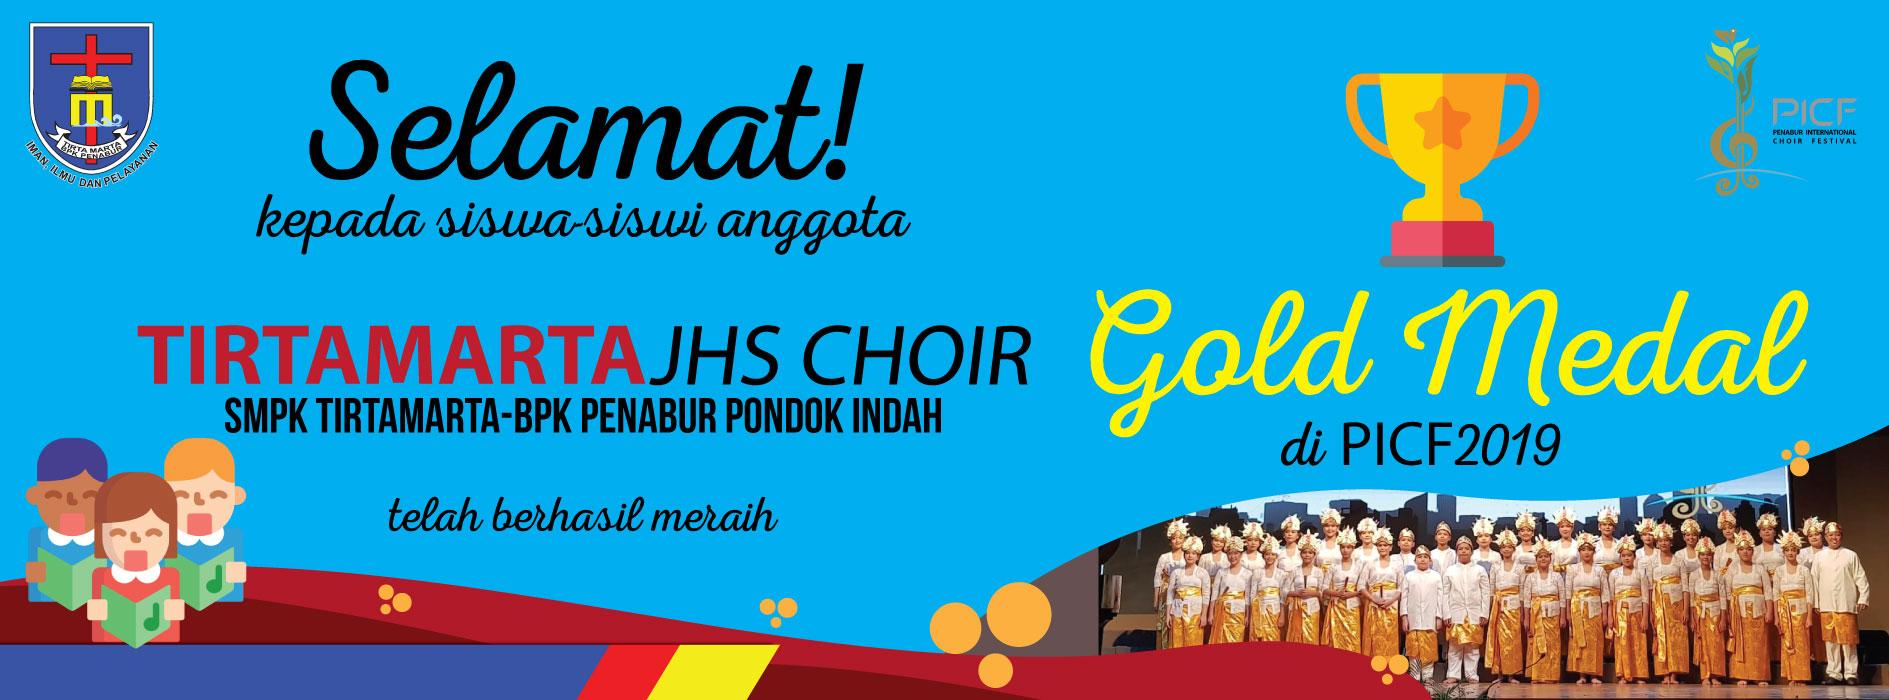 gold Medal Tirtamarta JHS Choir SMPK BPK Penabur Pondok Indah PCIF 2019